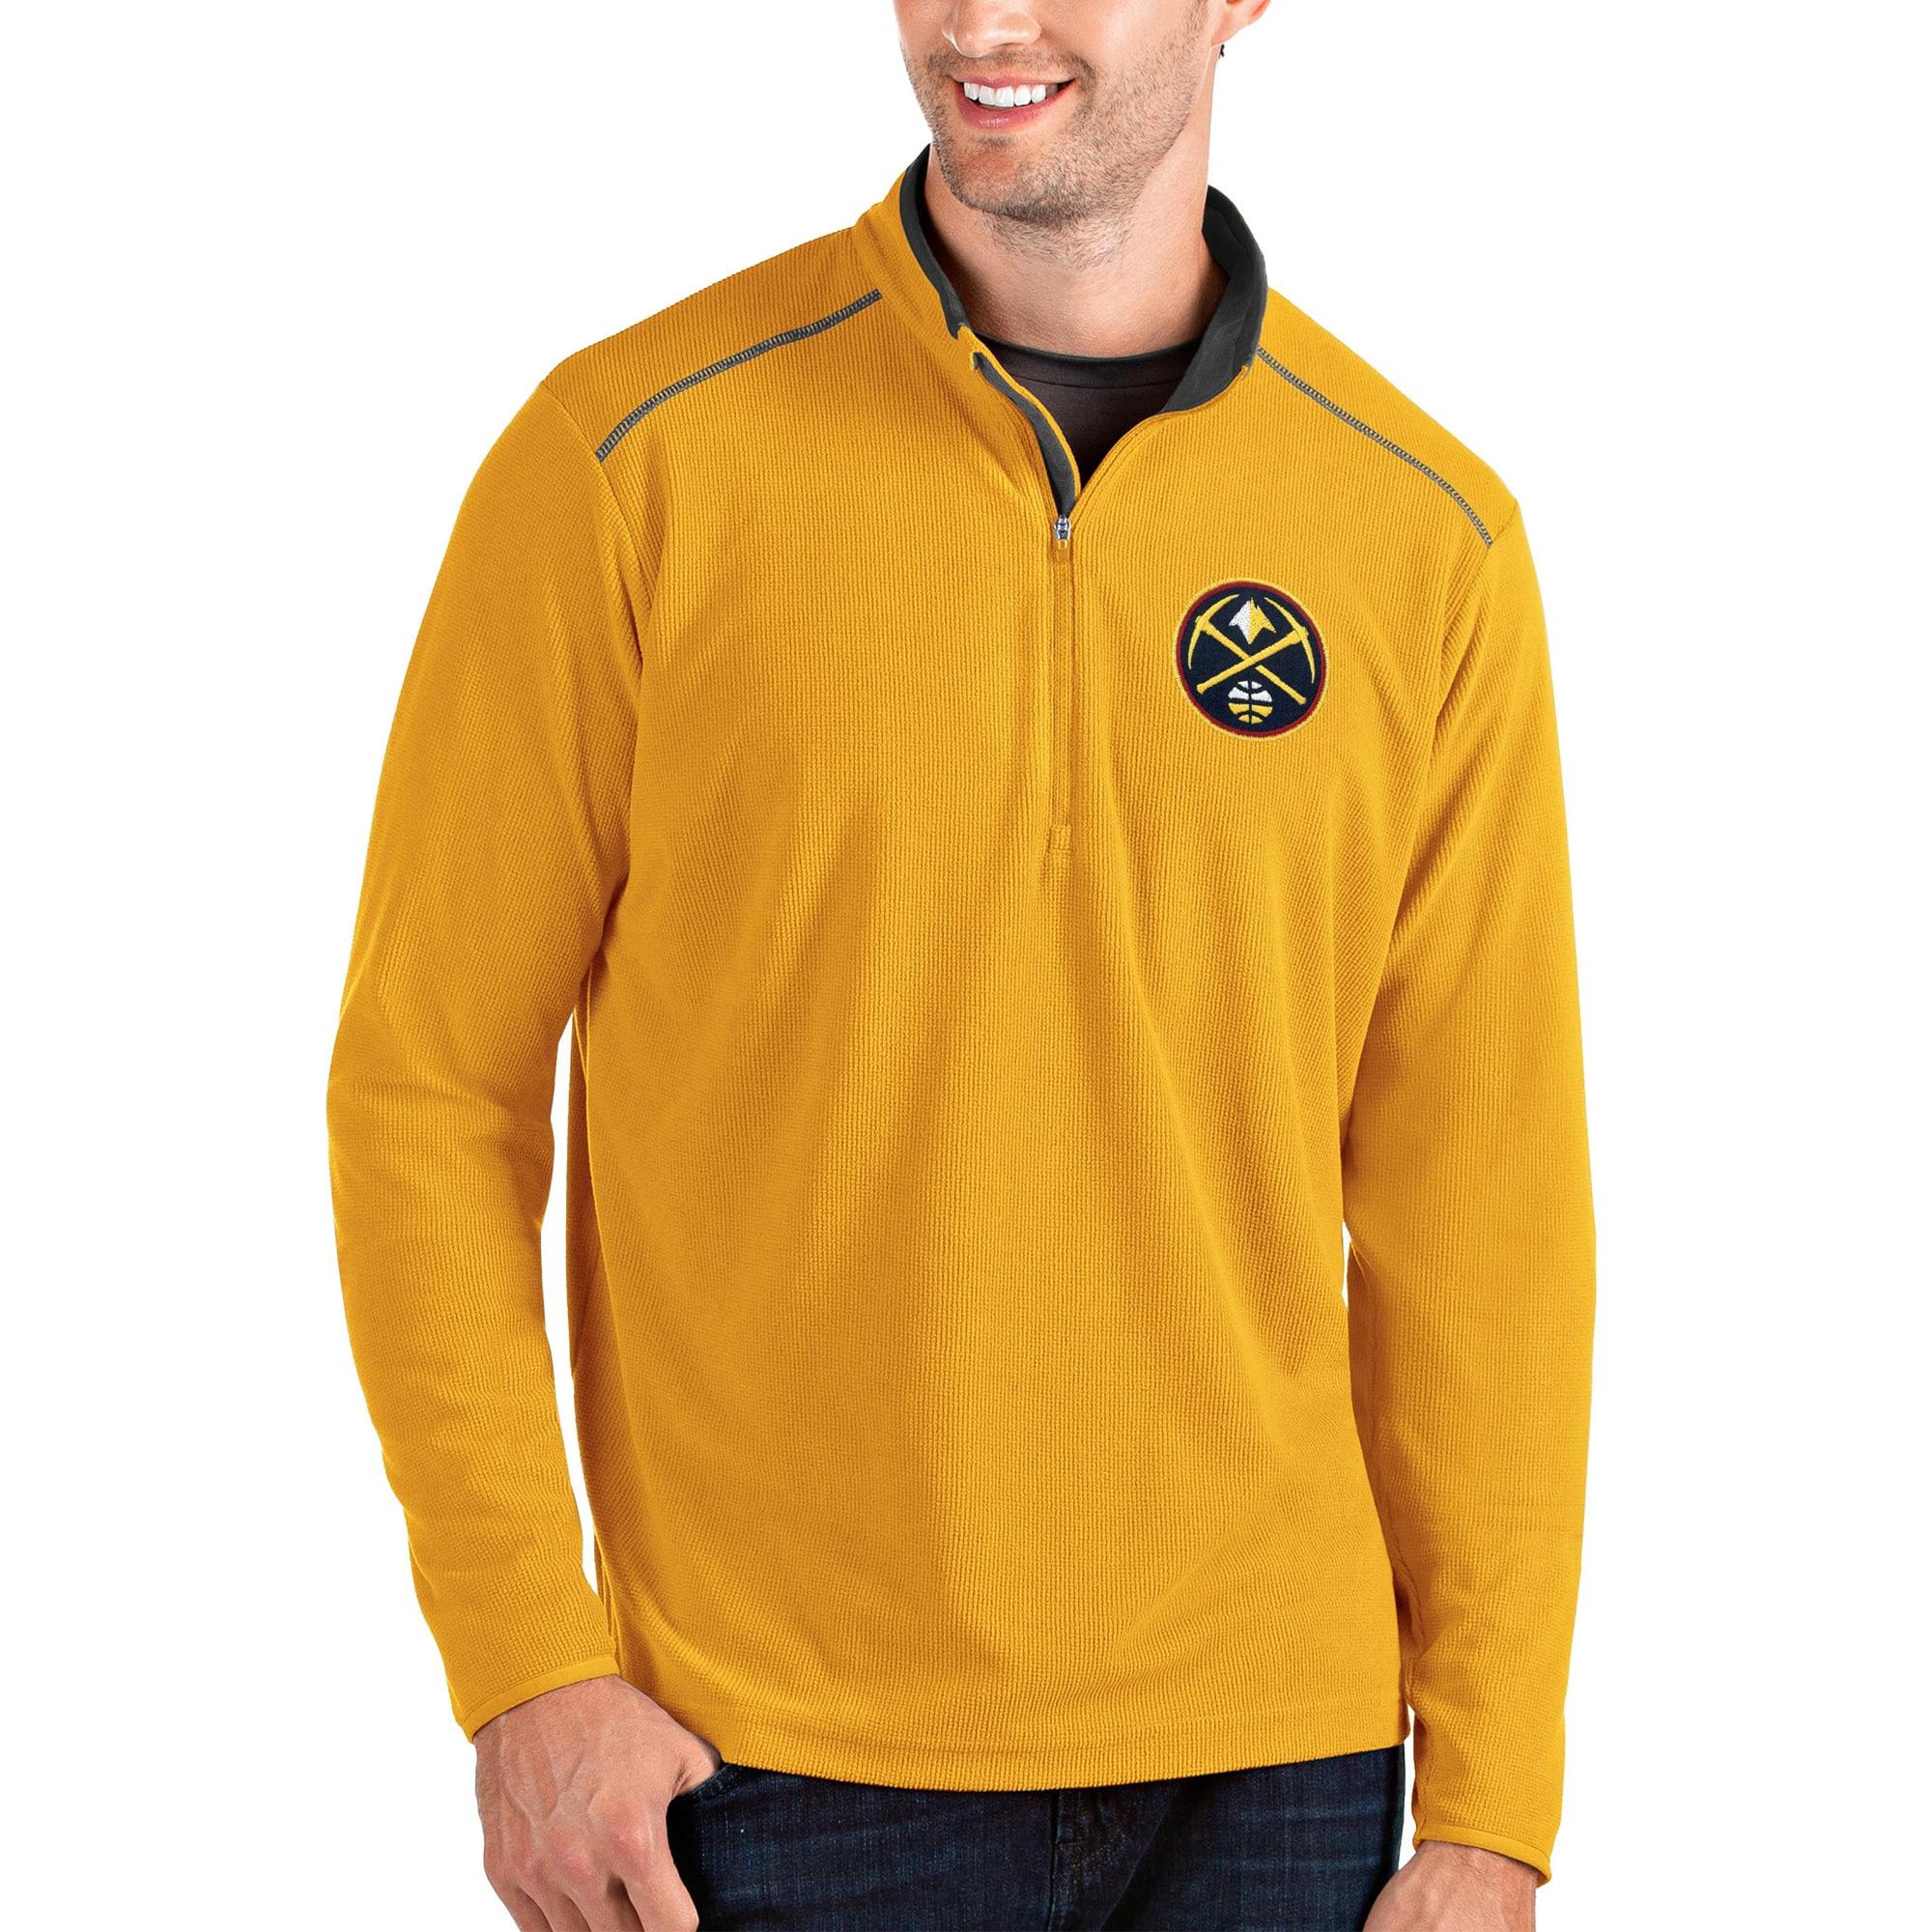 Denver Nuggets Antigua Glacier Quarter-Zip Pullover Jacket - Gold/Gray